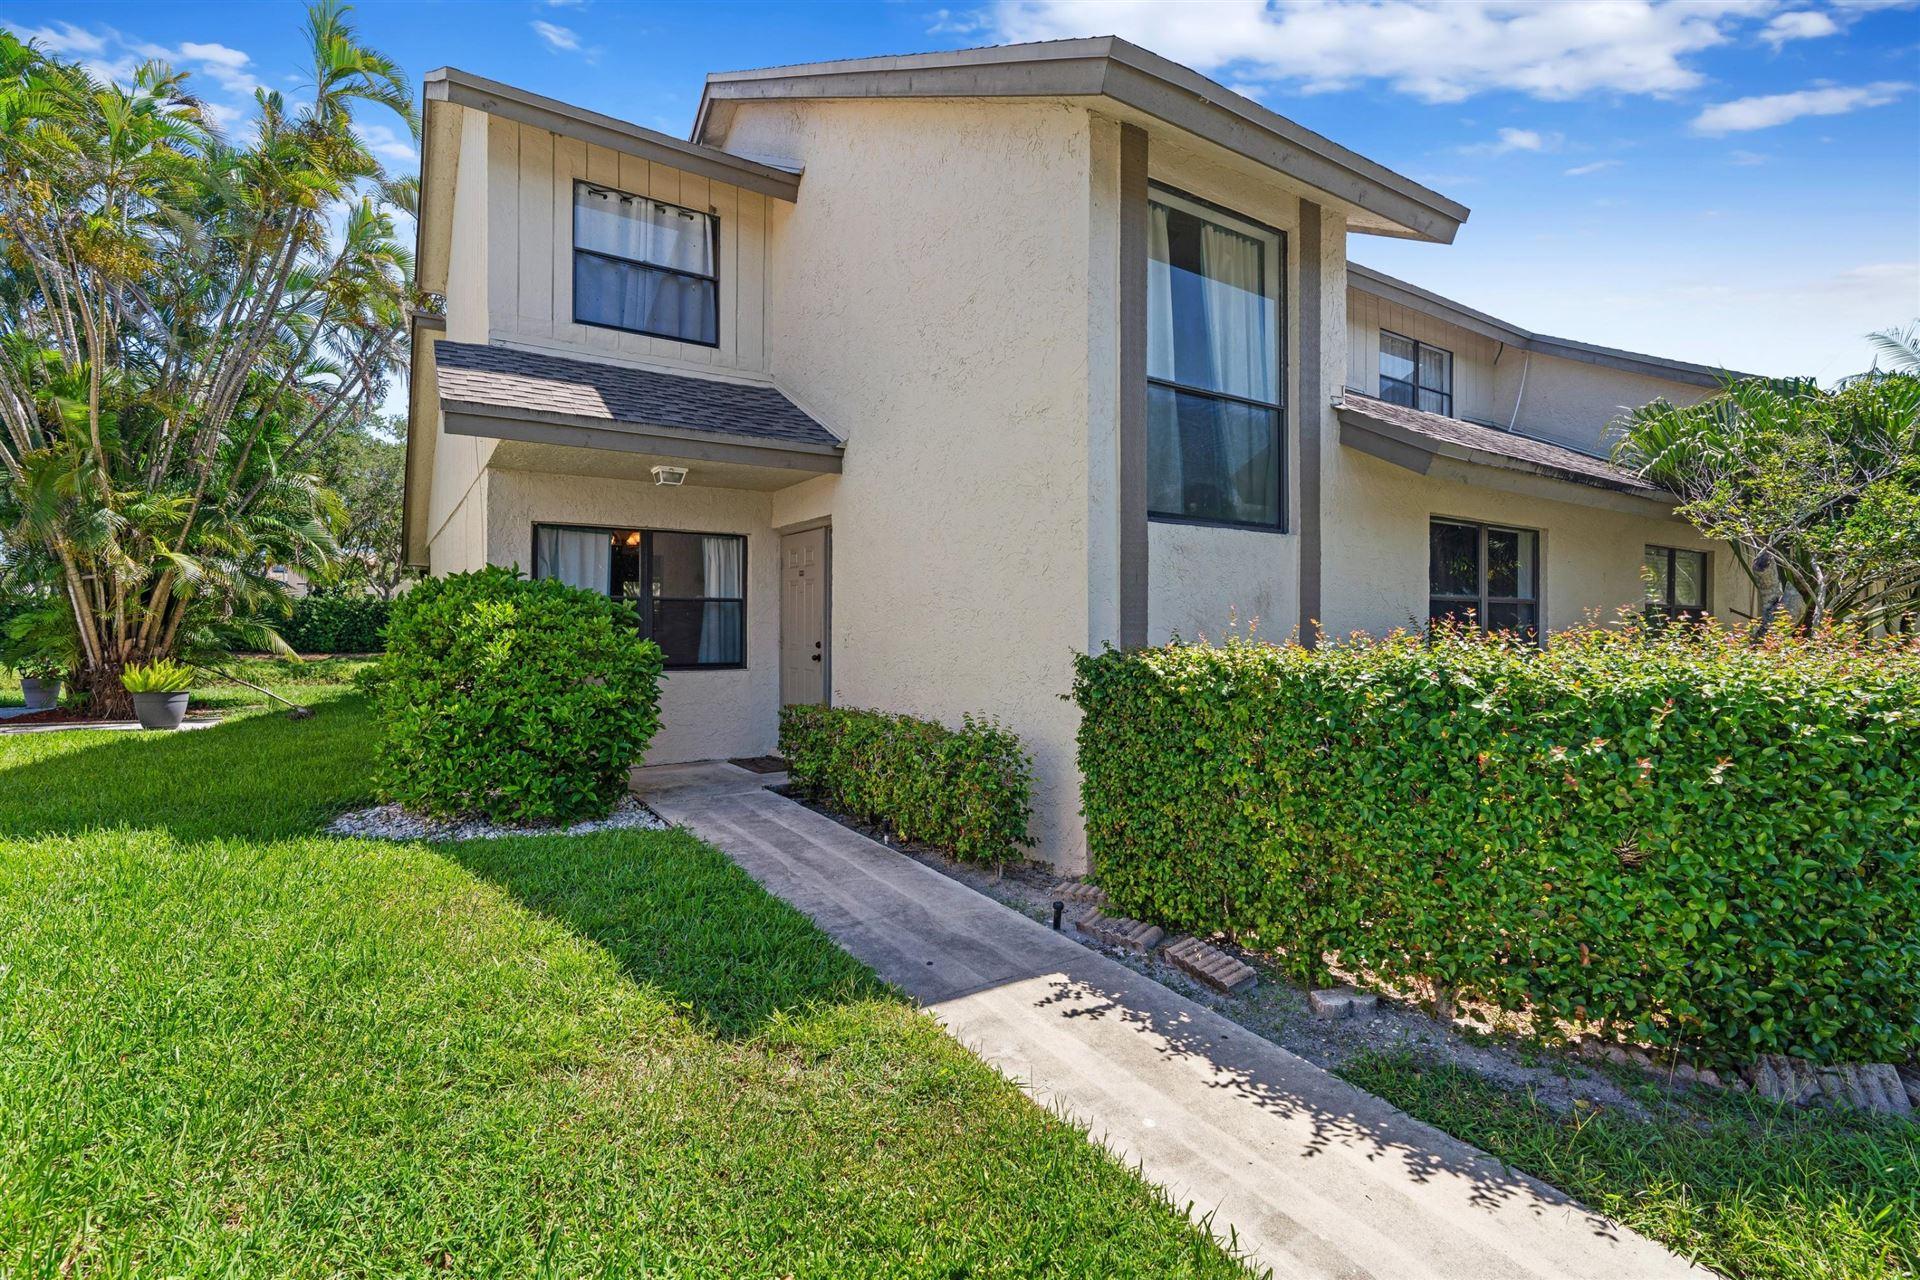 9340 Ketay Circle, Boca Raton, FL 33428 - MLS#: RX-10735031